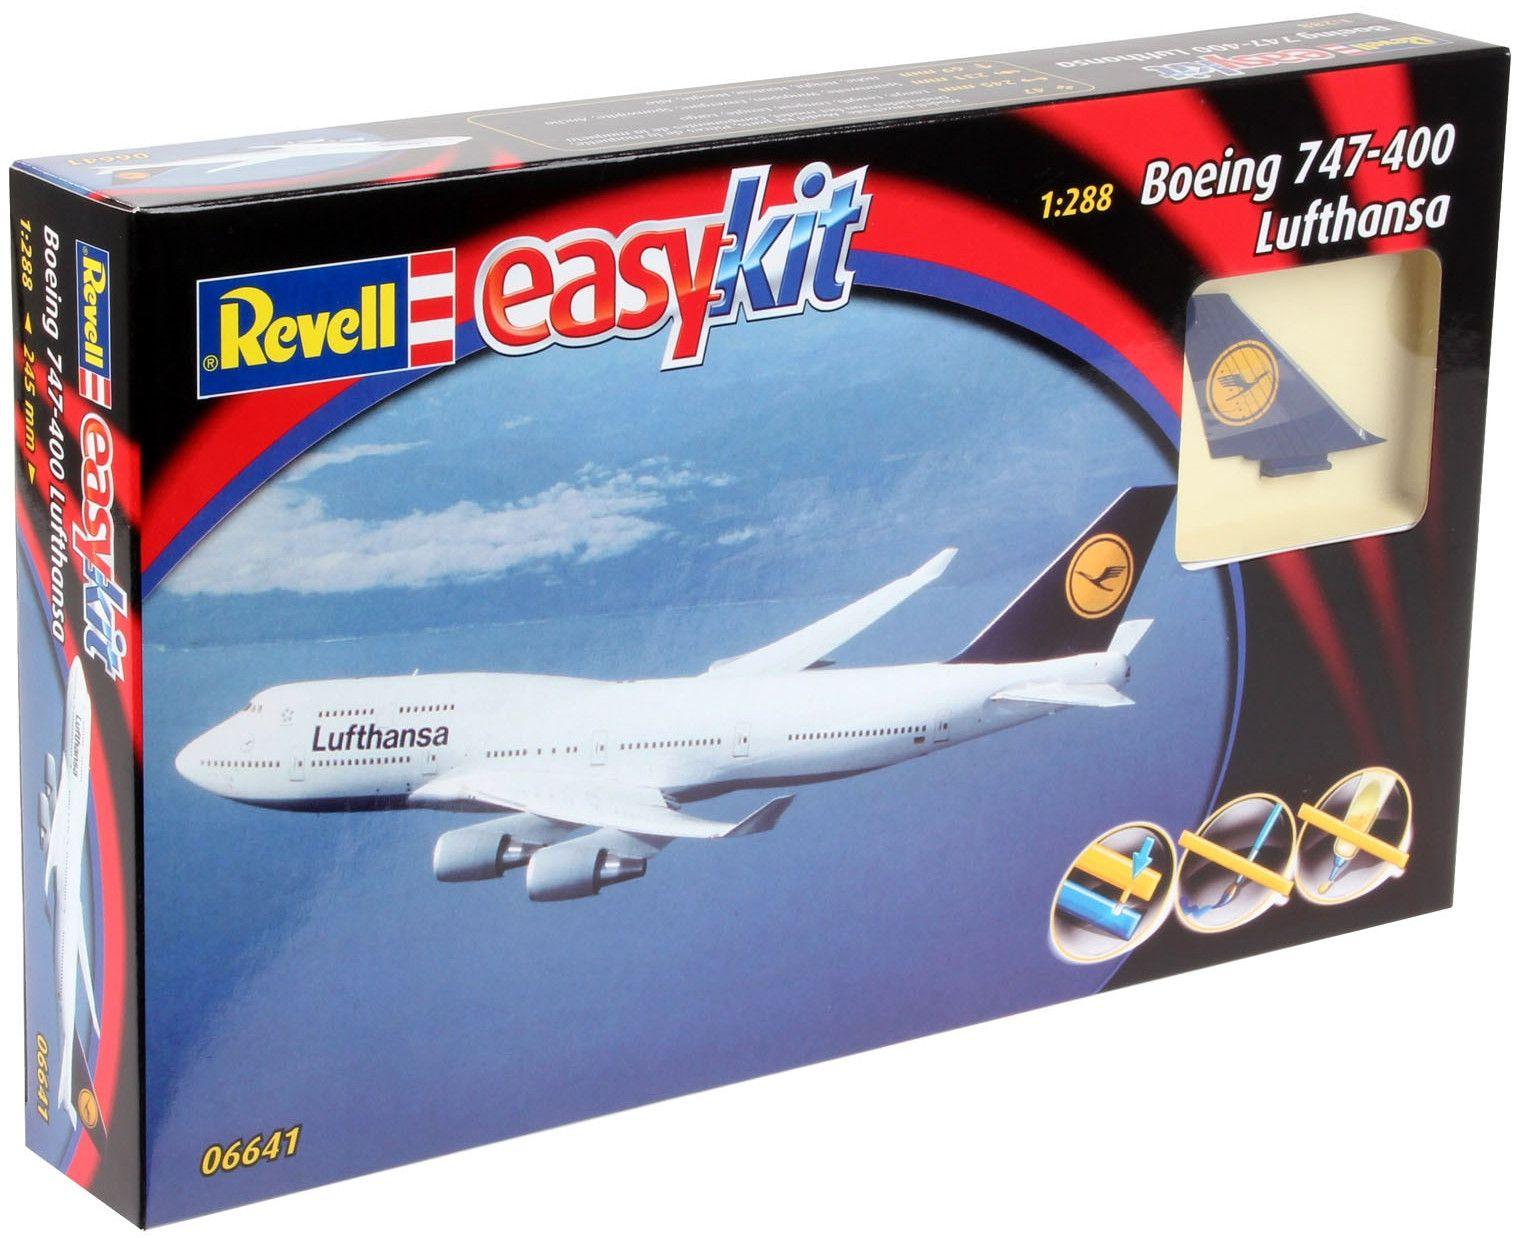 Сглобяем модел на самолет Revell Easykit - Boeing 747-400 Lufthansa (06641) - 4